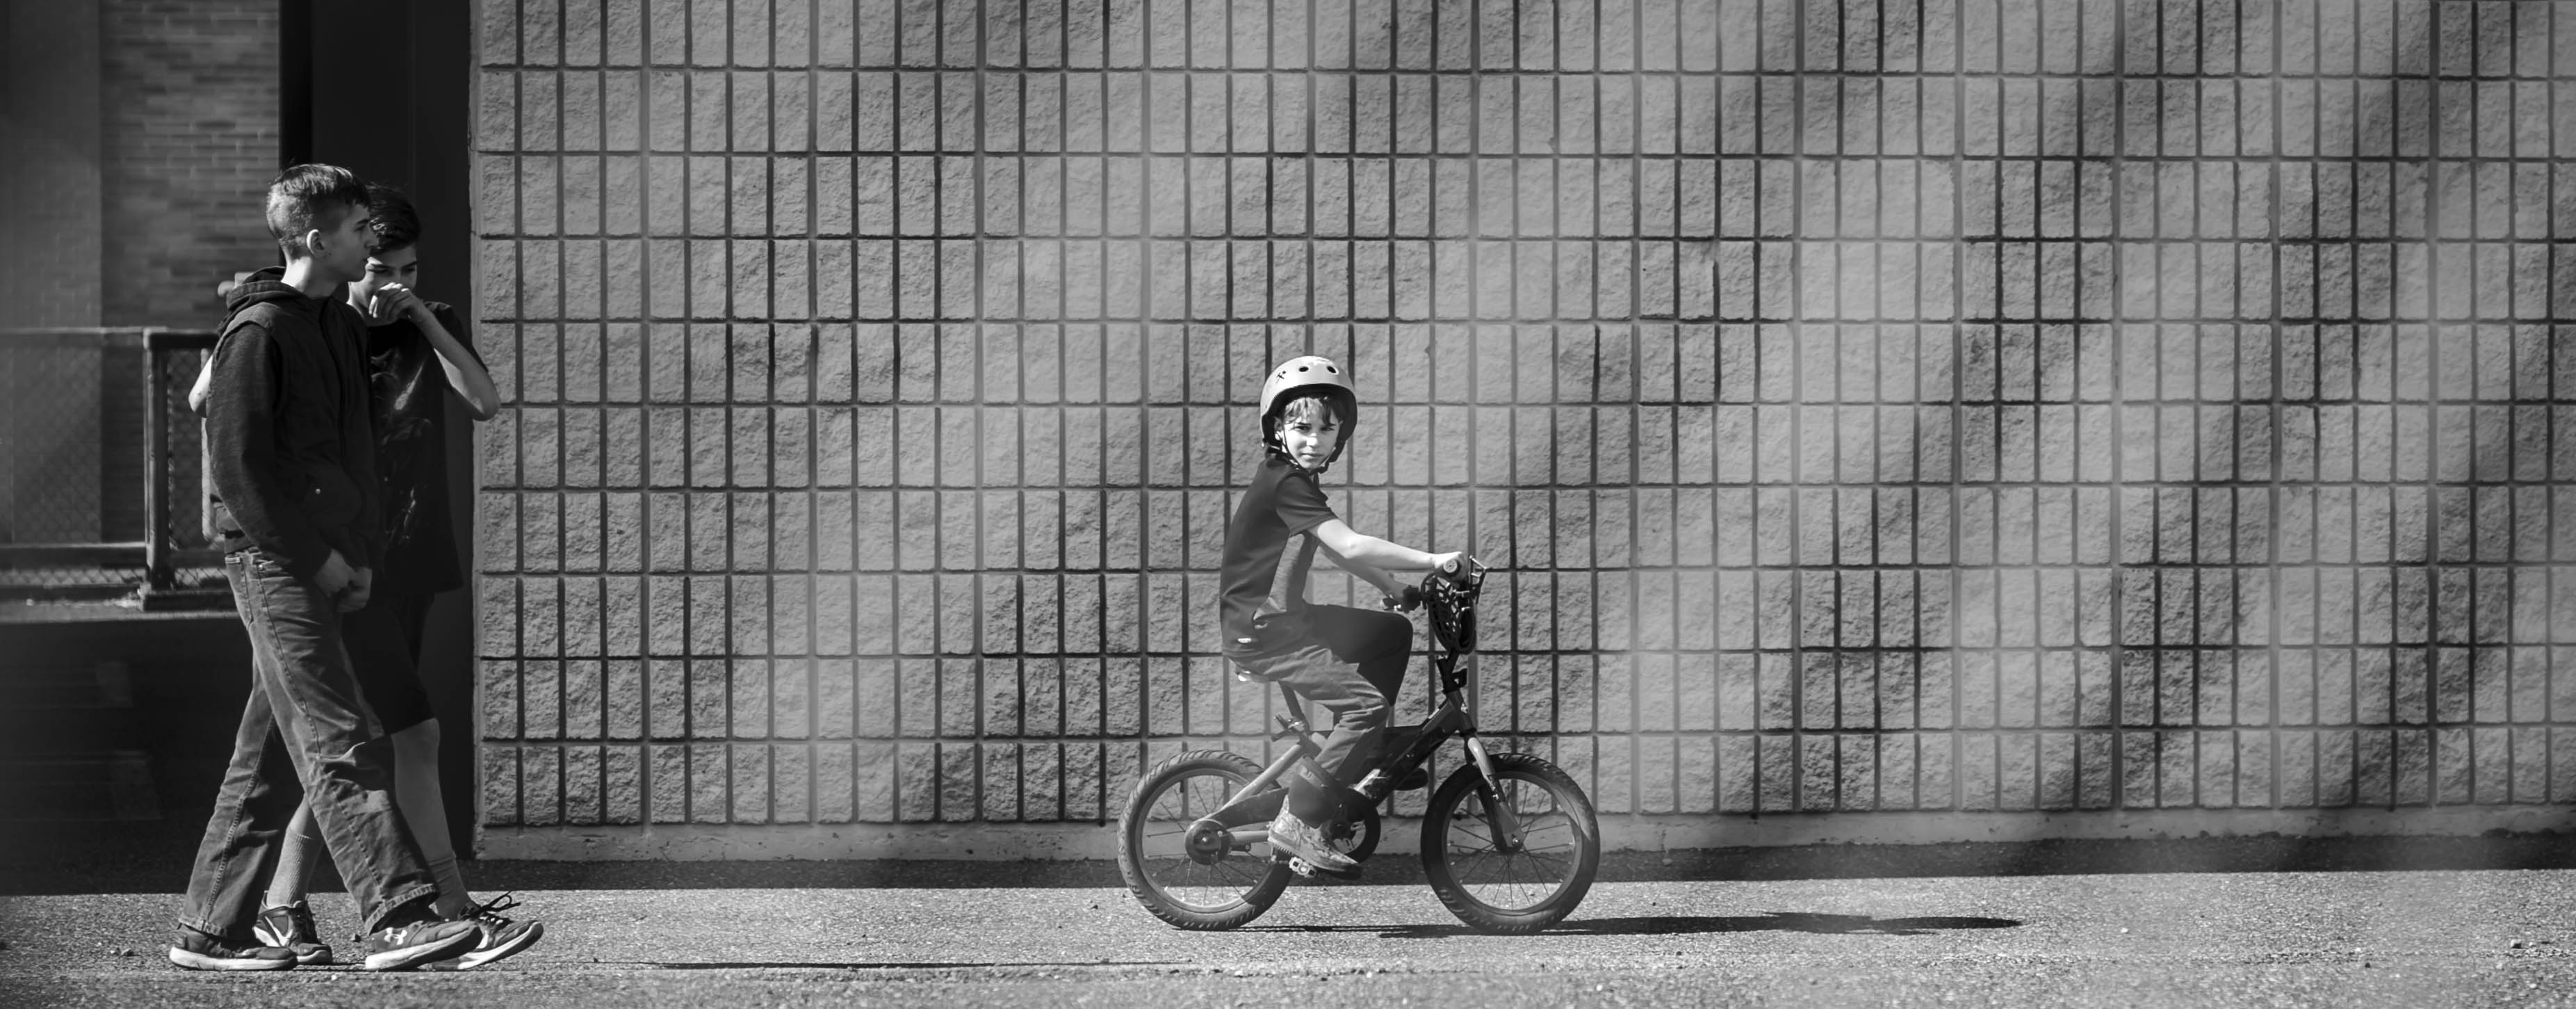 Boys on Bikes